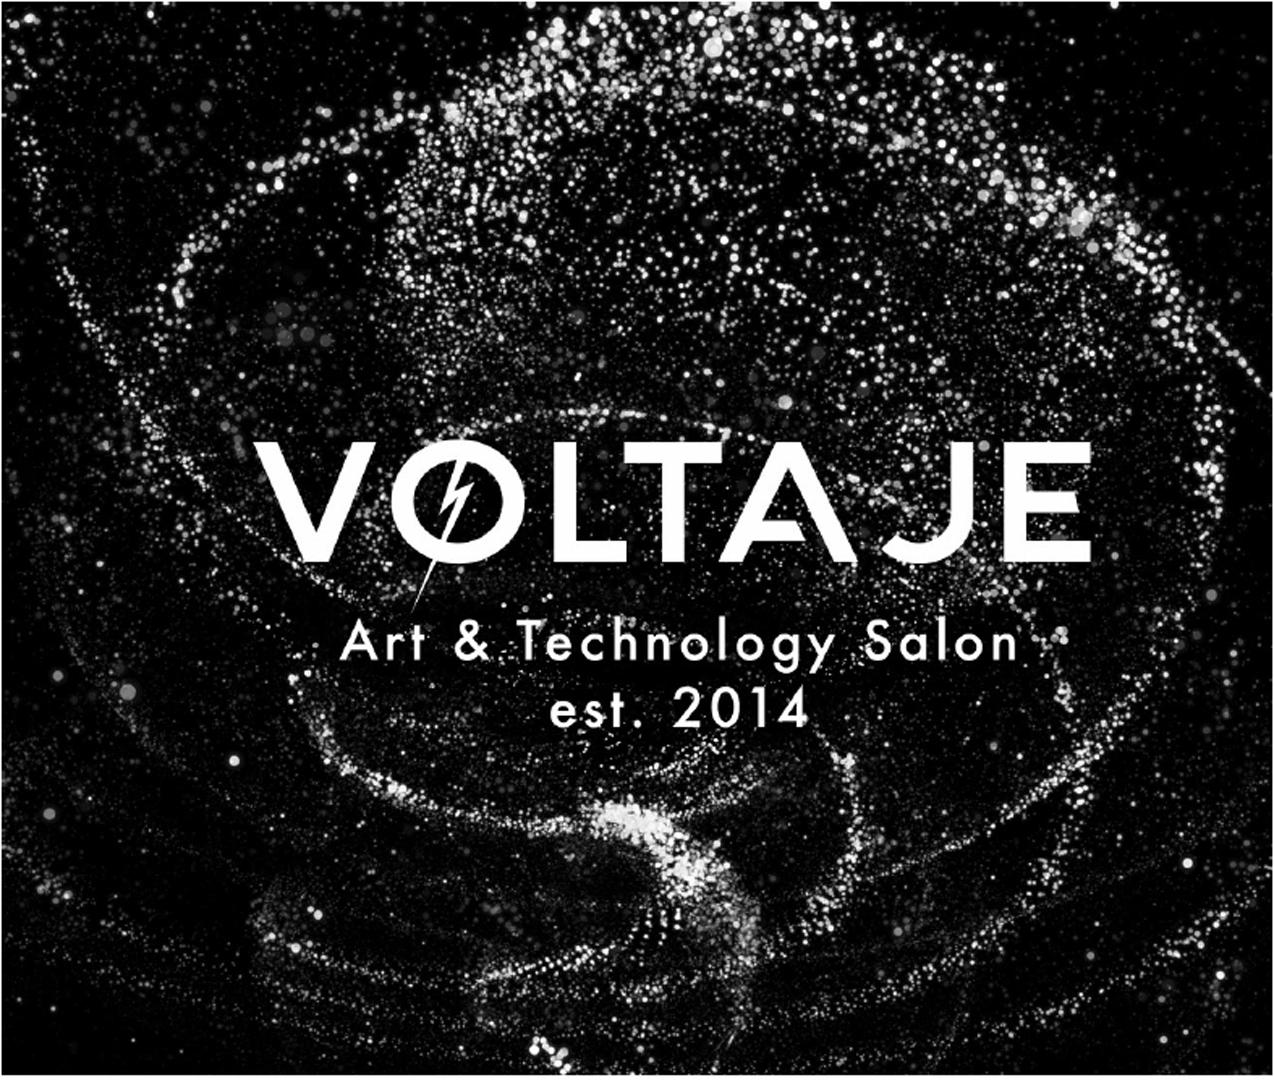 ©ISEA2019: 25th International Symposium on Electronic Art, Carmen Gil Vrolijk, Voltaje (Art and Technology Salon)